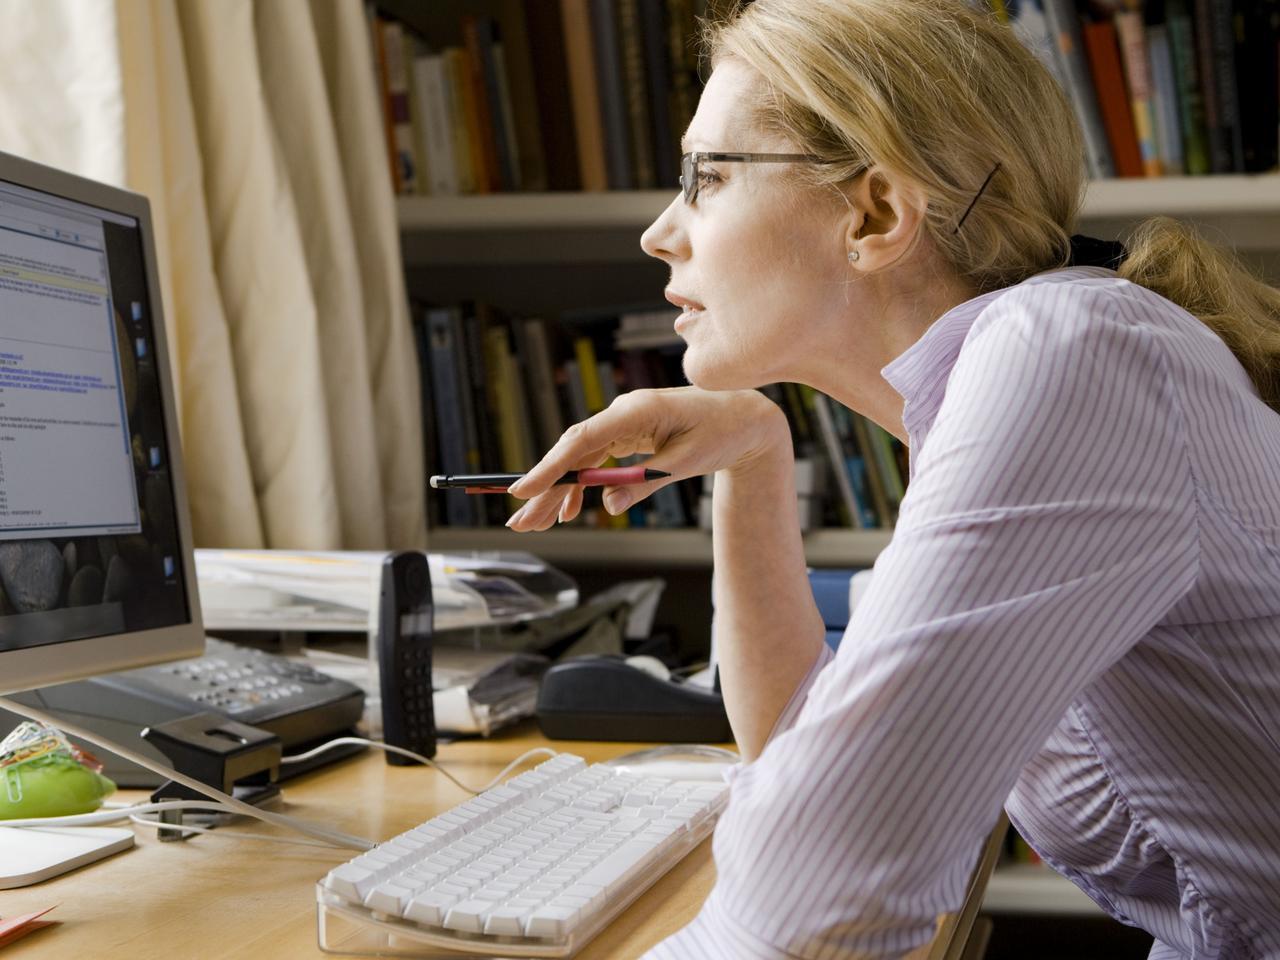 Woman studying computer screen. Generic image. Thinkstock.